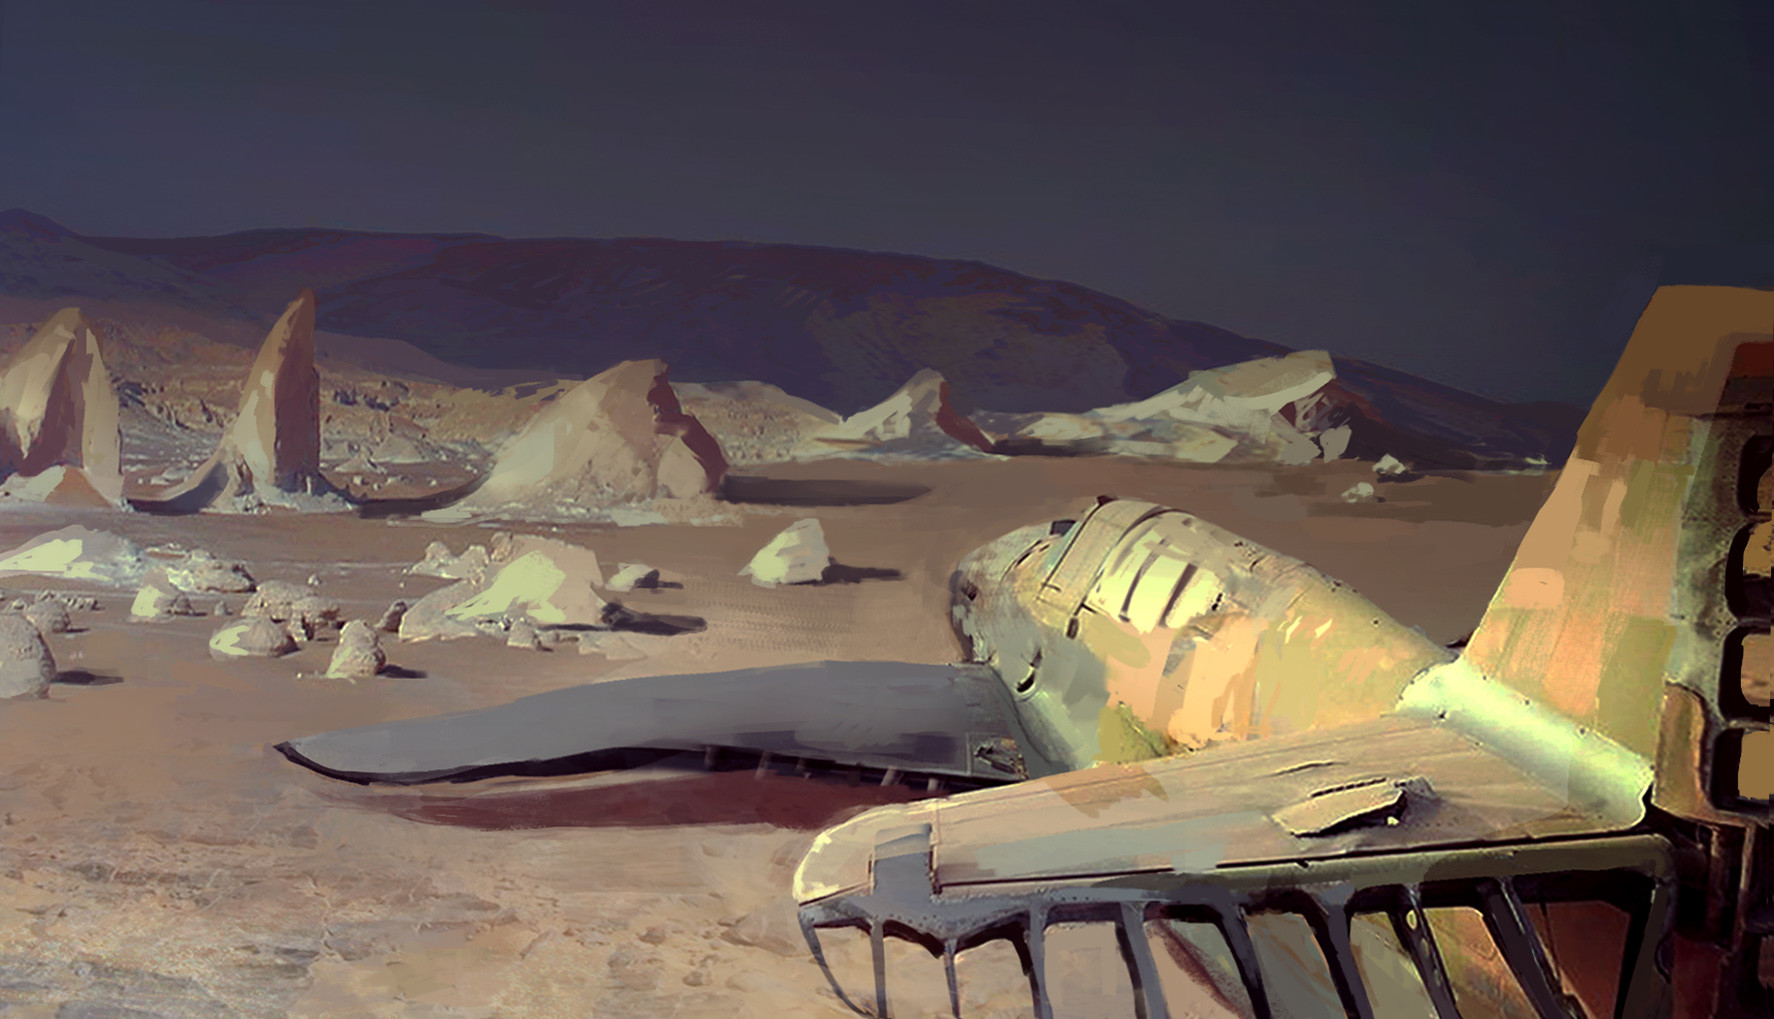 Pat fix samolot na pustyni